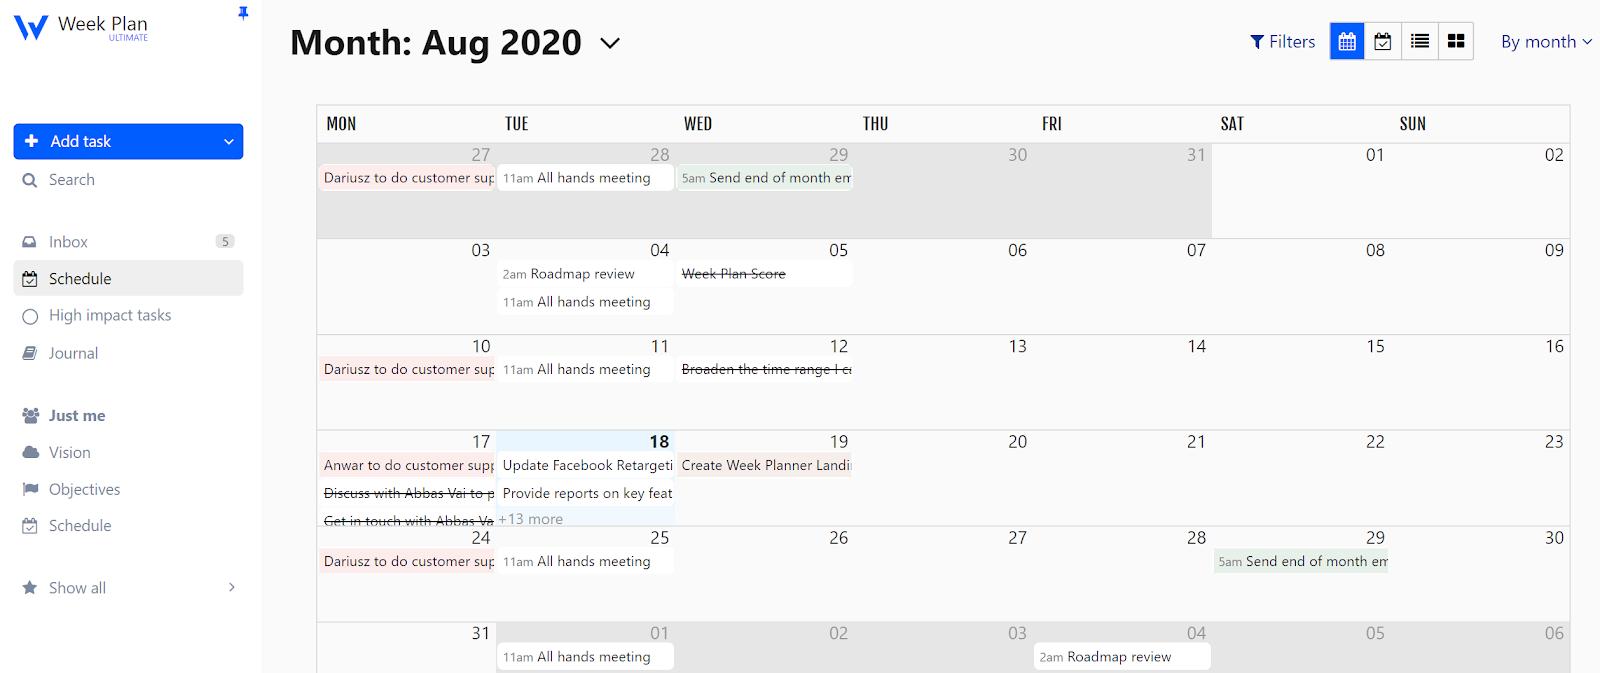 Week-Plan-Work-Planner-Team-Calendar